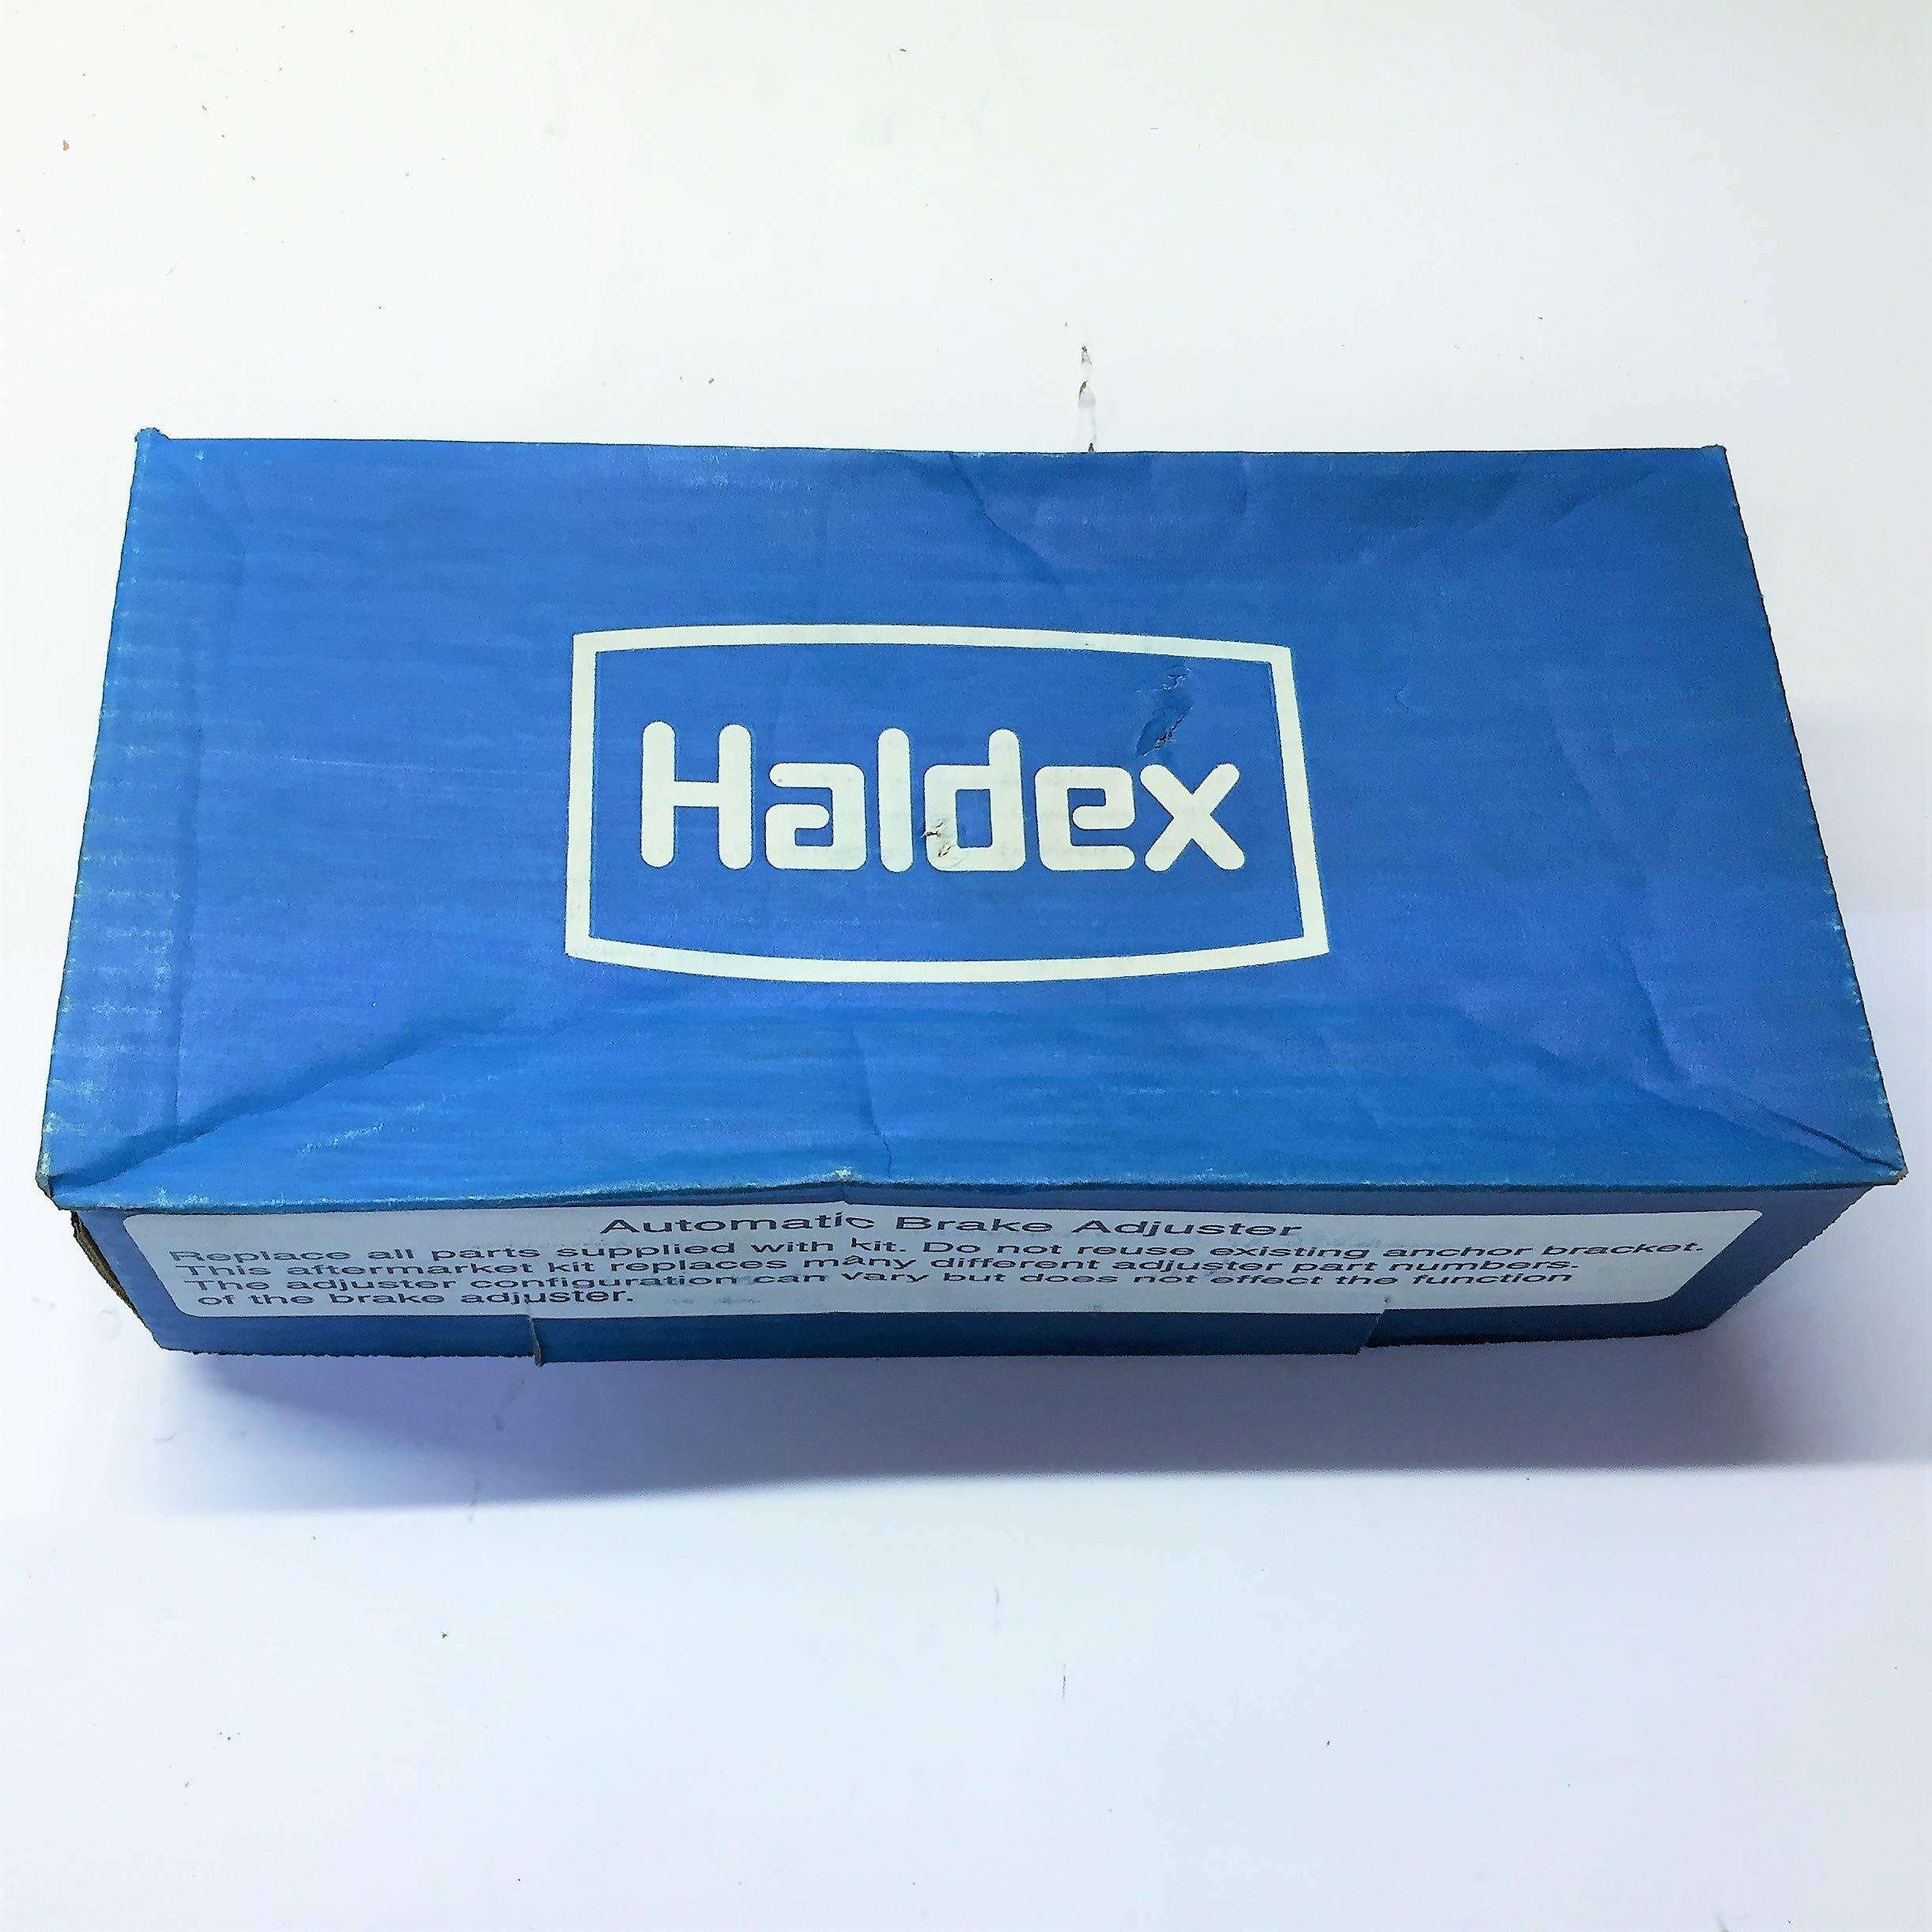 Haldex Automatic Brake Adjuster 409-10590 by Haldex (Image #6)